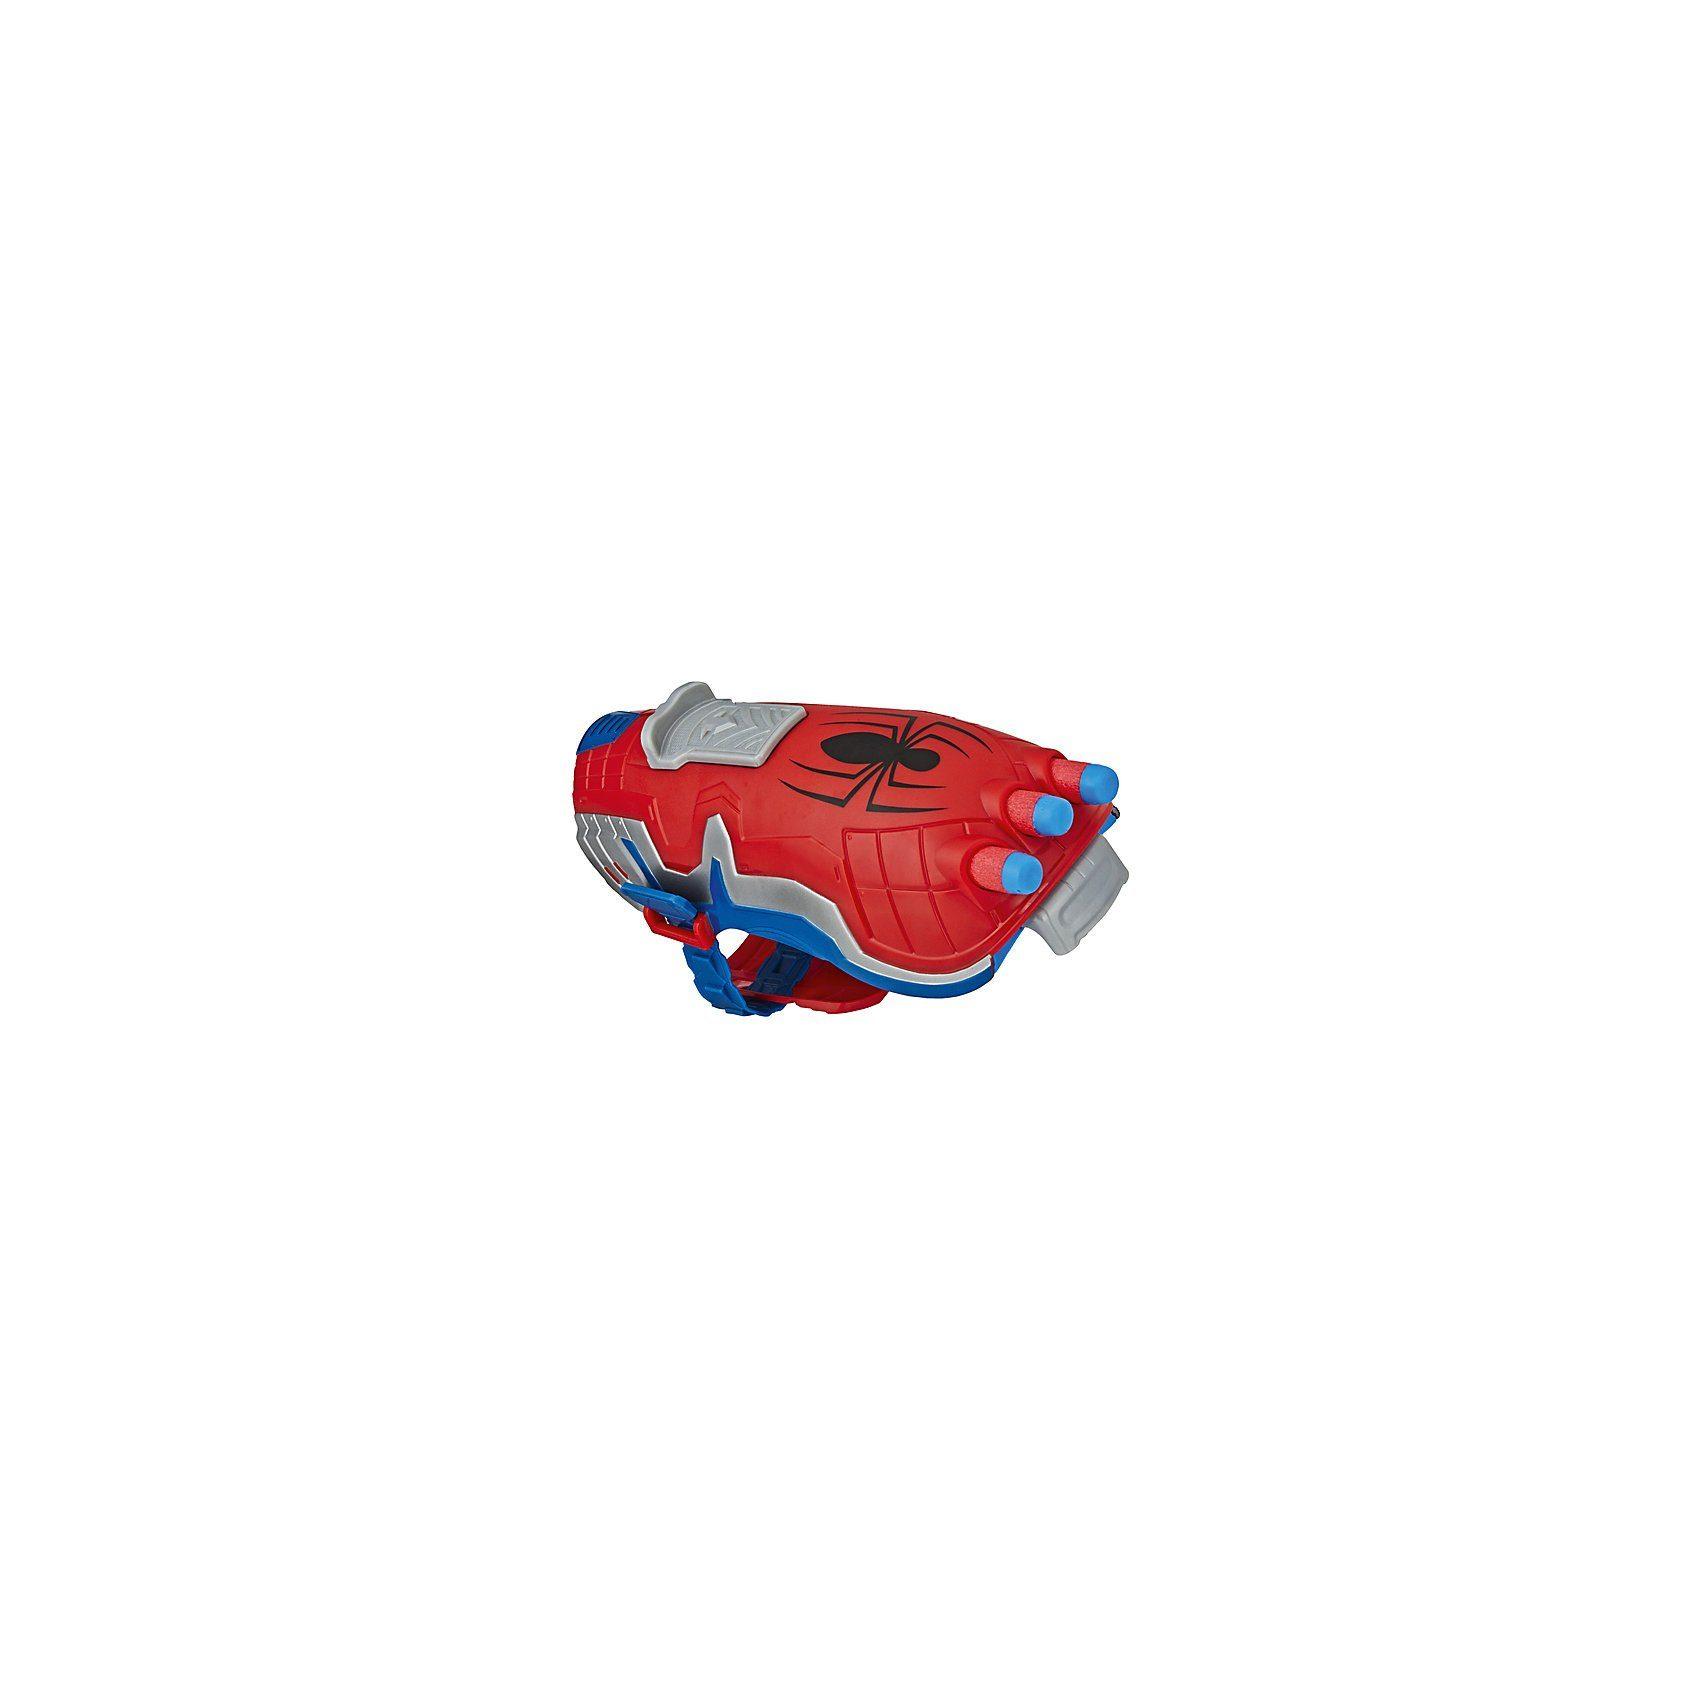 Hasbro Spider-Man Deluxe Web Blaster